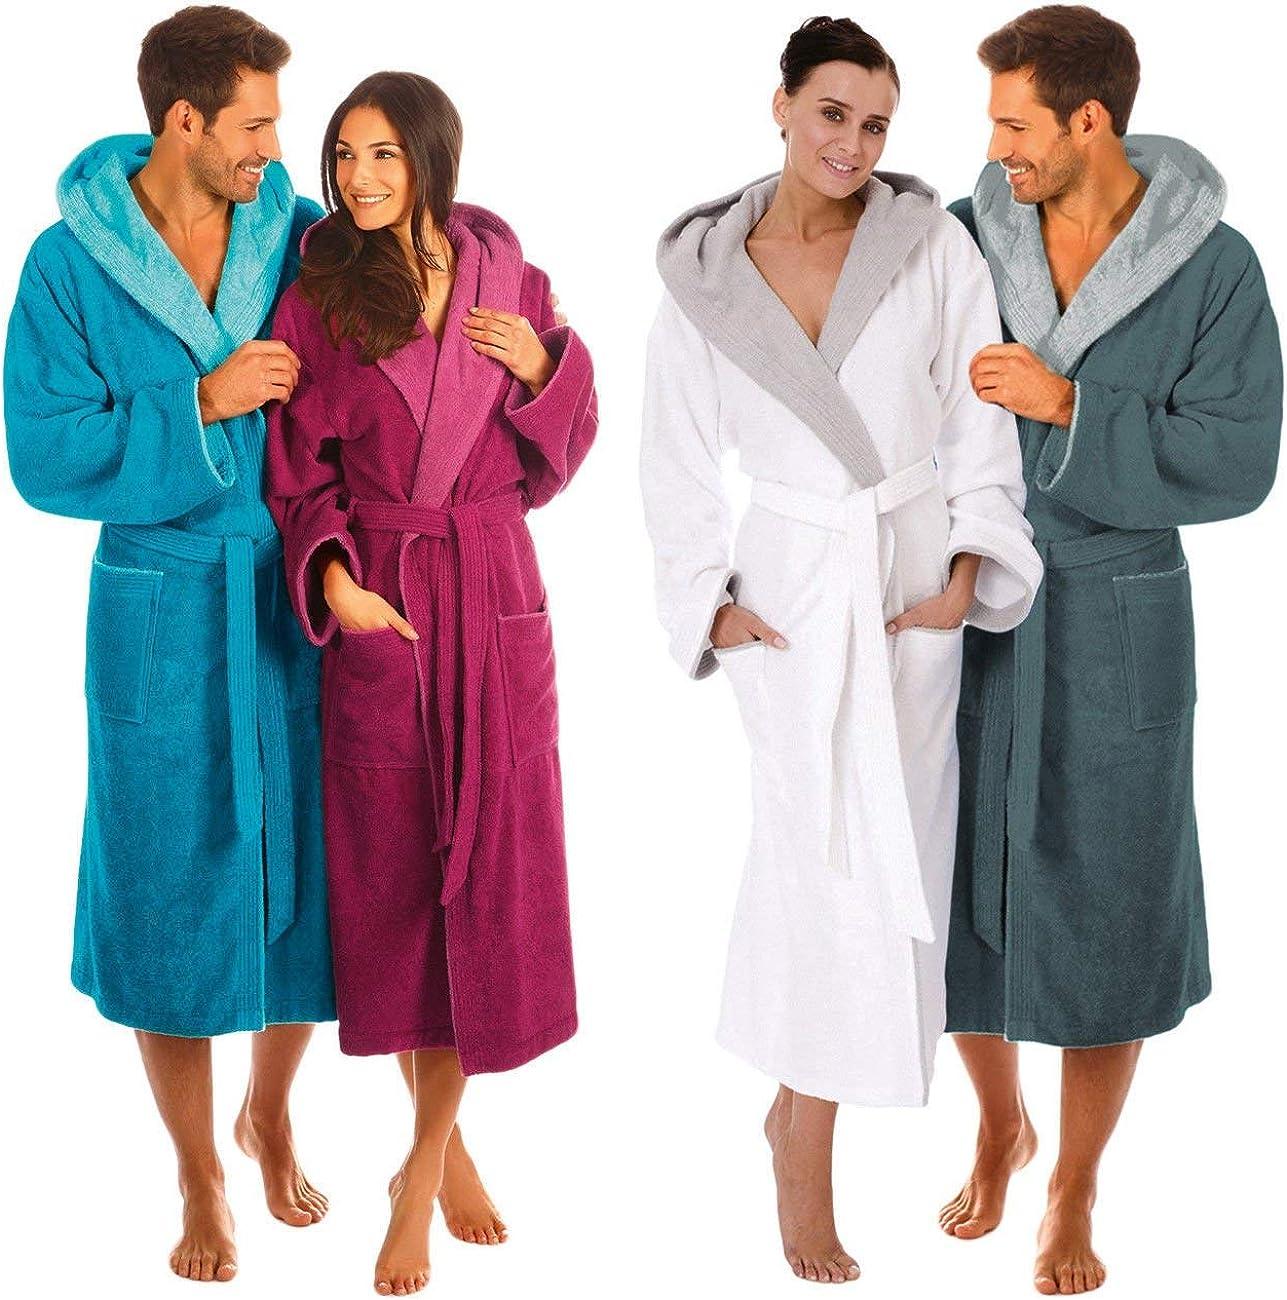 Egeria Cairo 2 Bathrobe Saunarobe with Hood for Women & Men by Eliwareexclusive with New Sizes Dark Grey/Light Grey